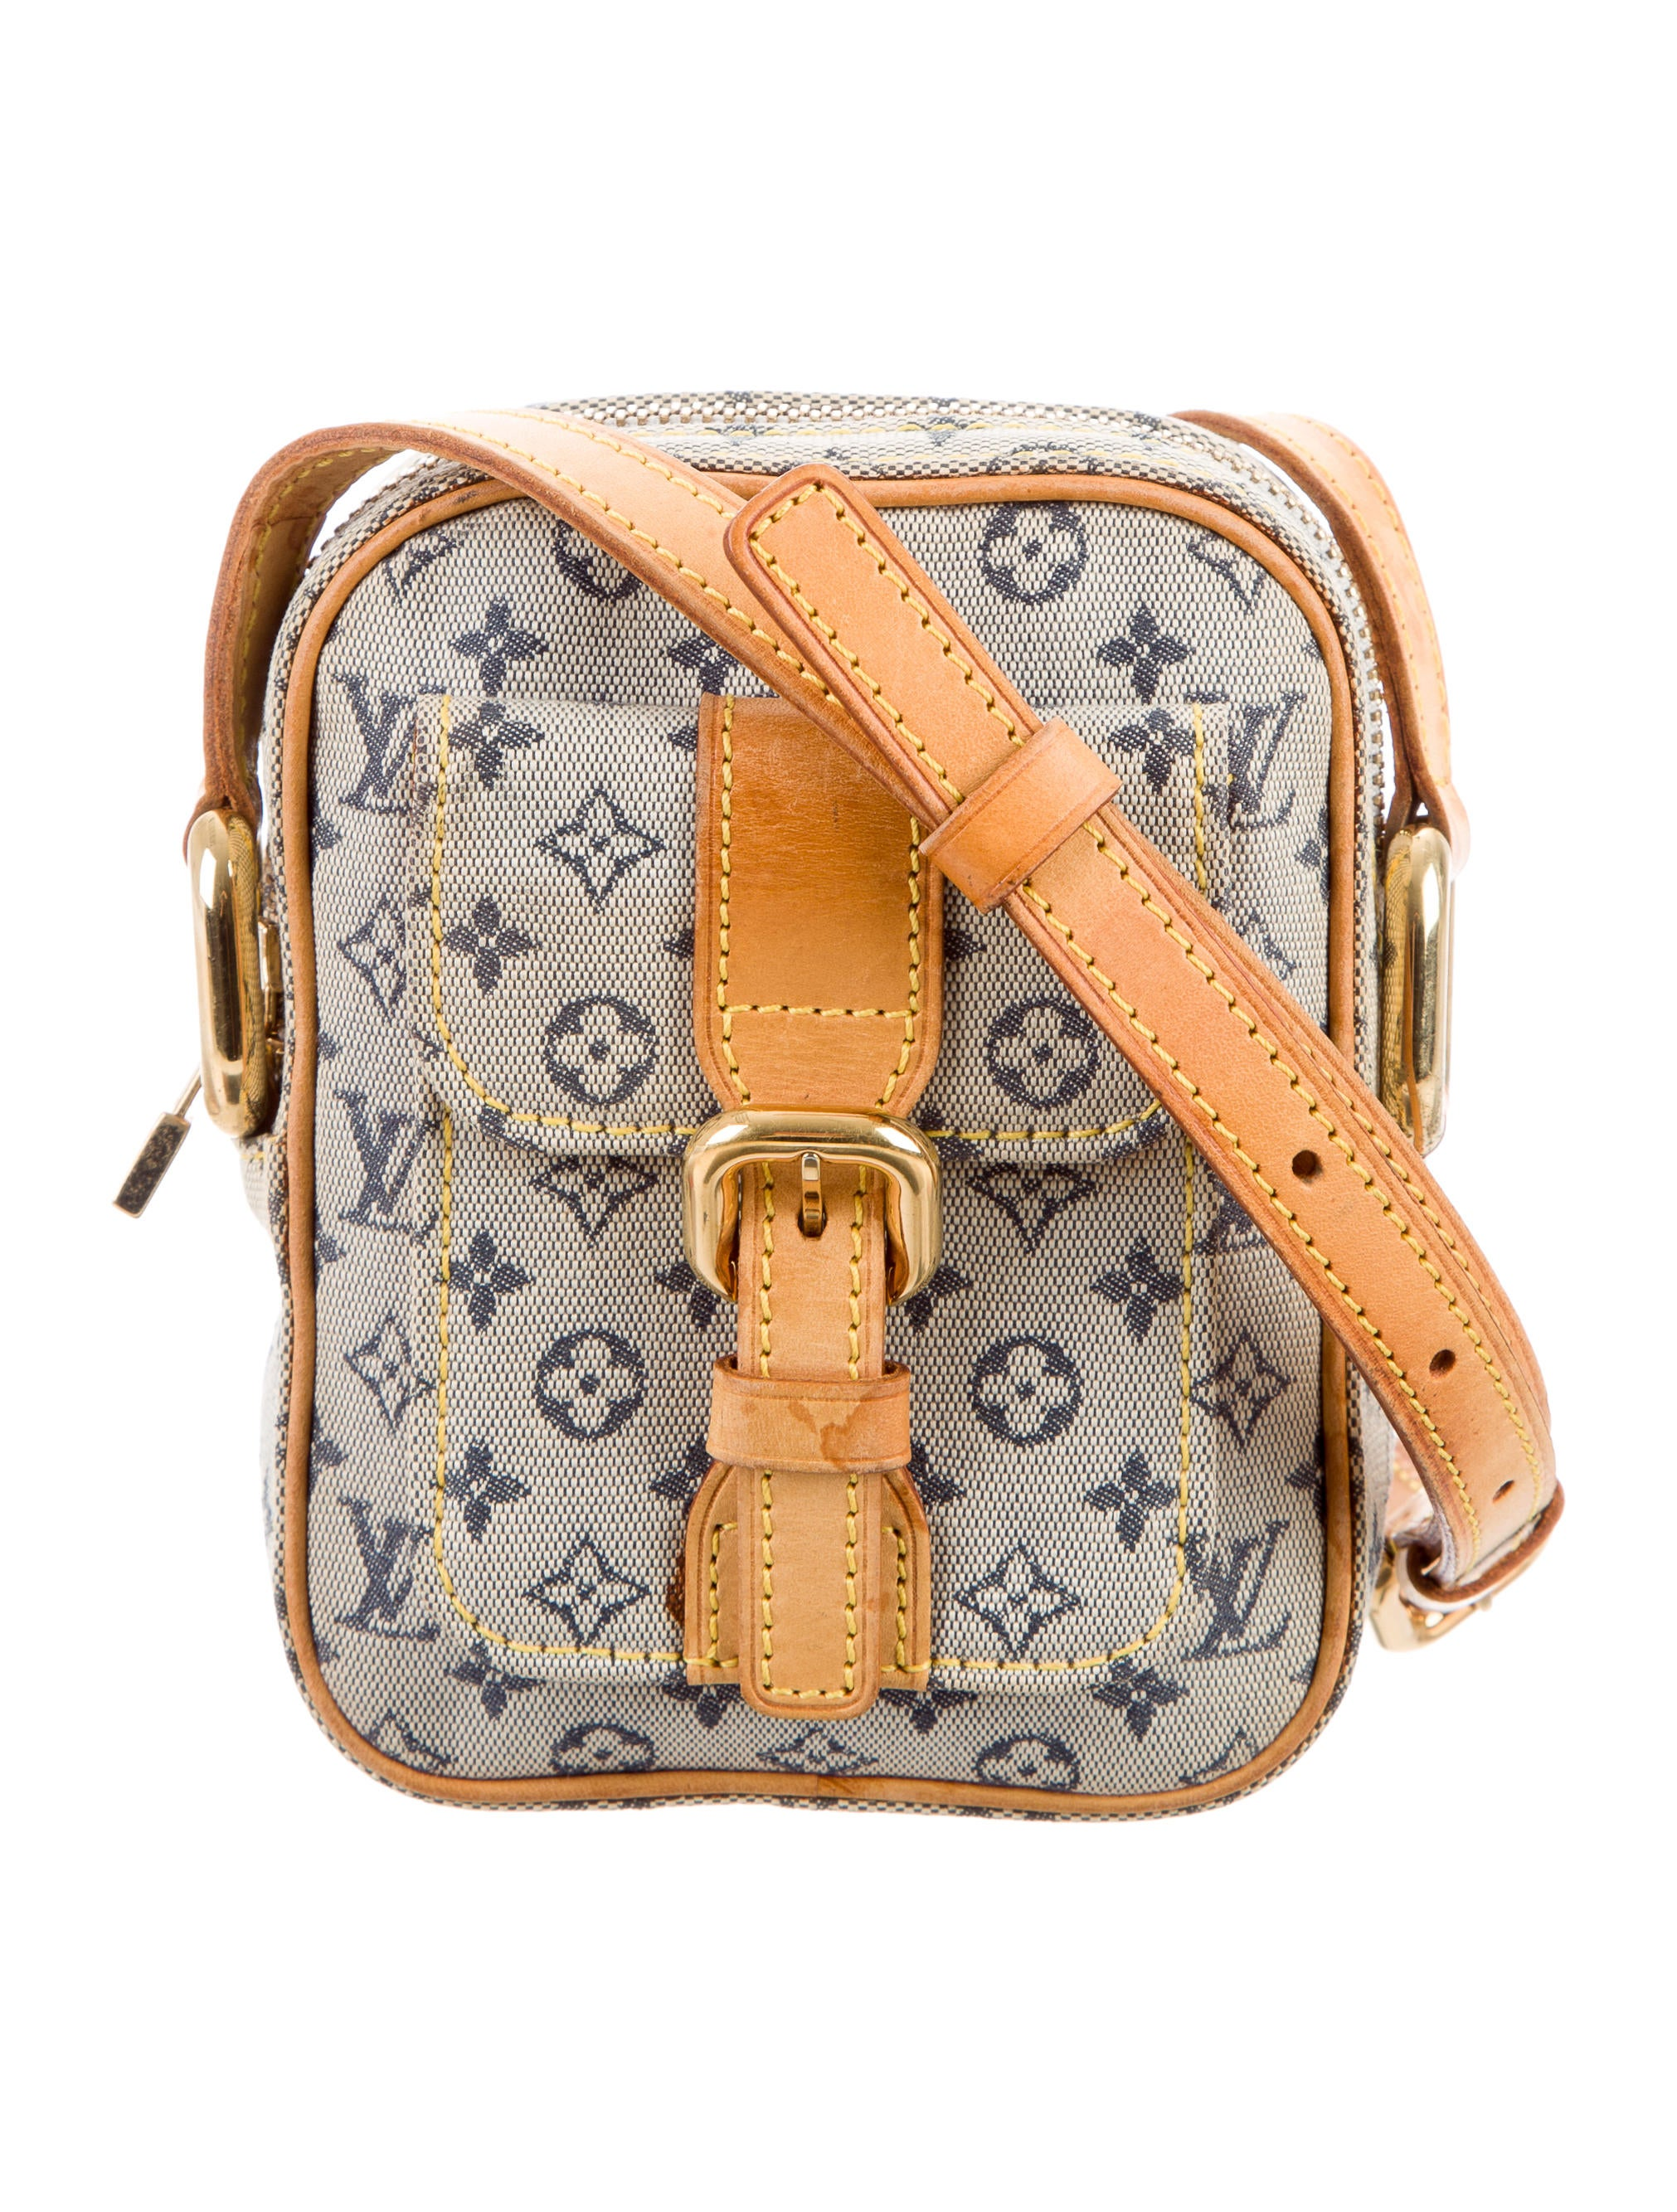 Louis Vuitton Mini Lin Juliette PM - Handbags - LOU105486  1ba14360555c3